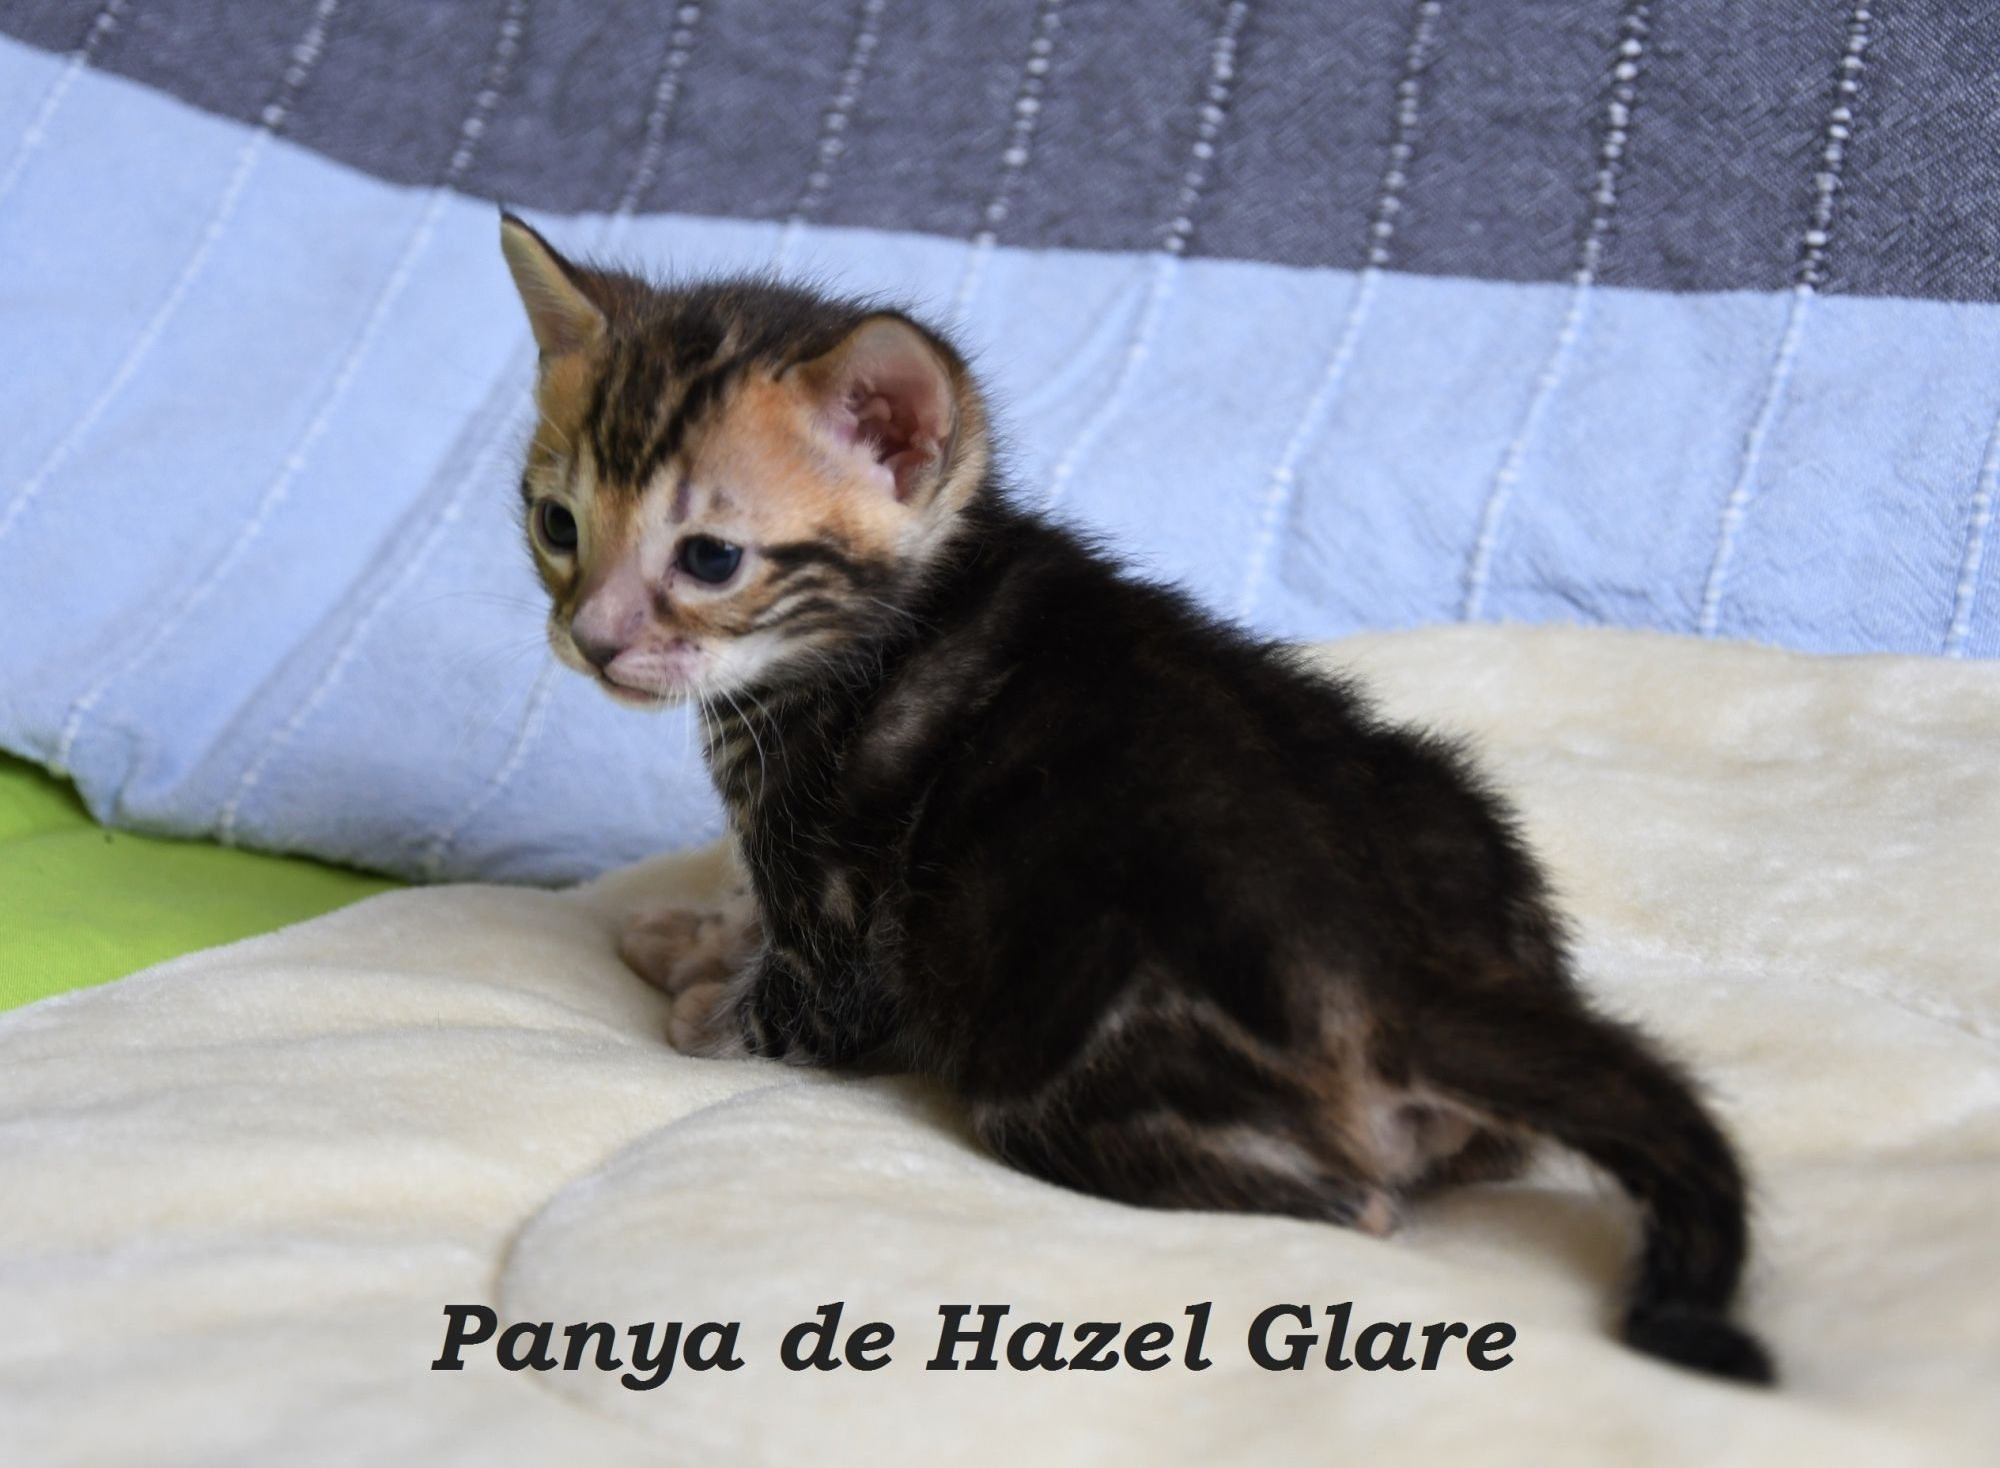 Panya de Hazel Glare